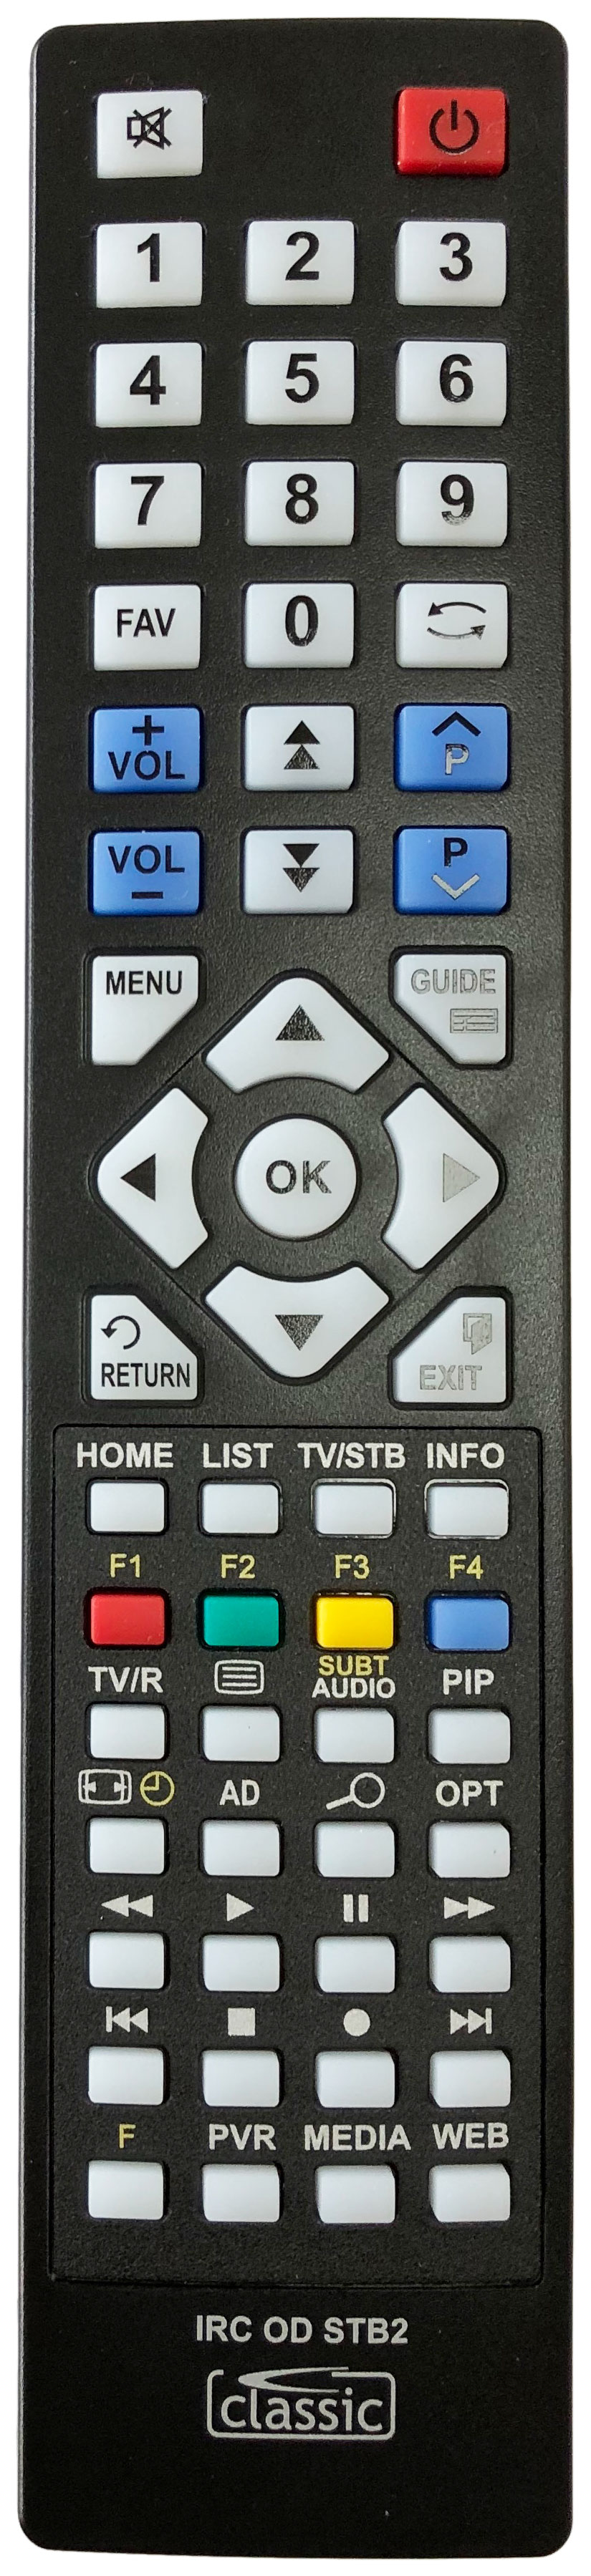 TVONICS DTRZ250 Remote Control